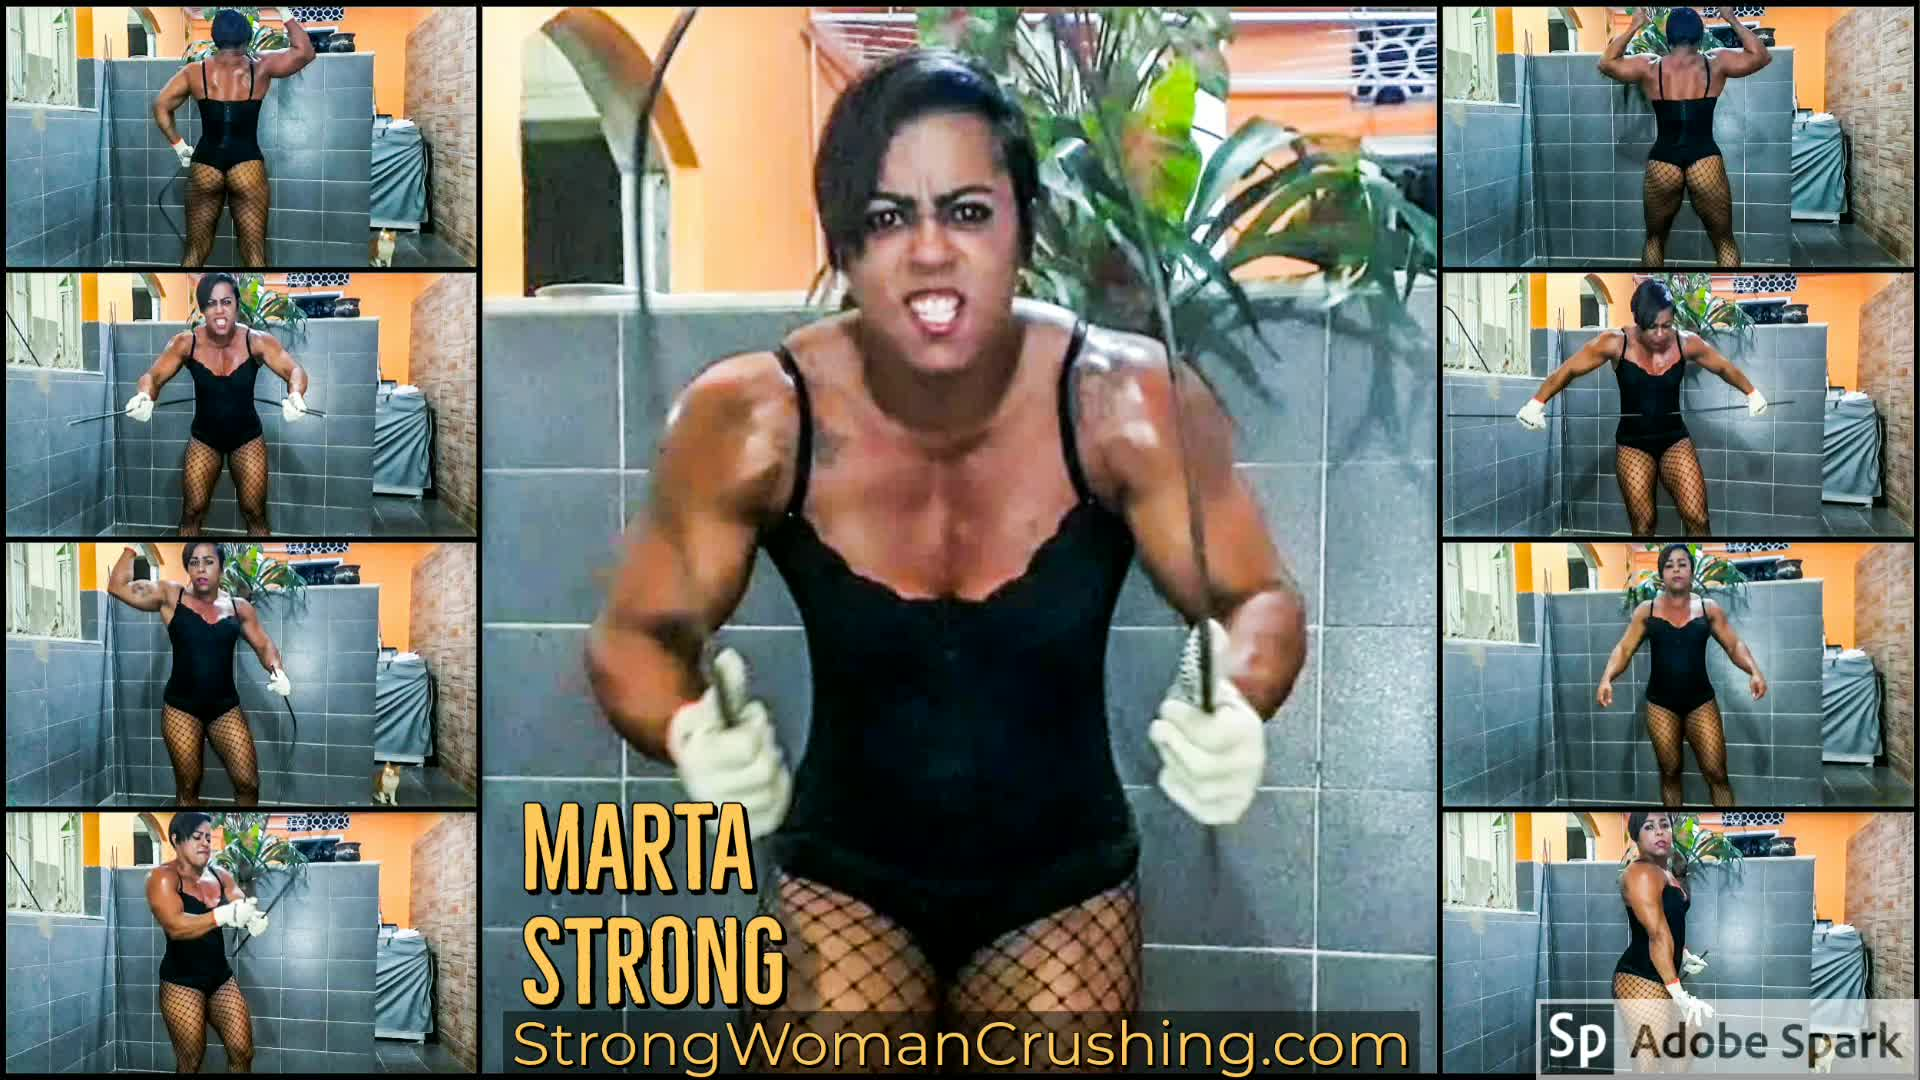 Marta strong metal bar bend